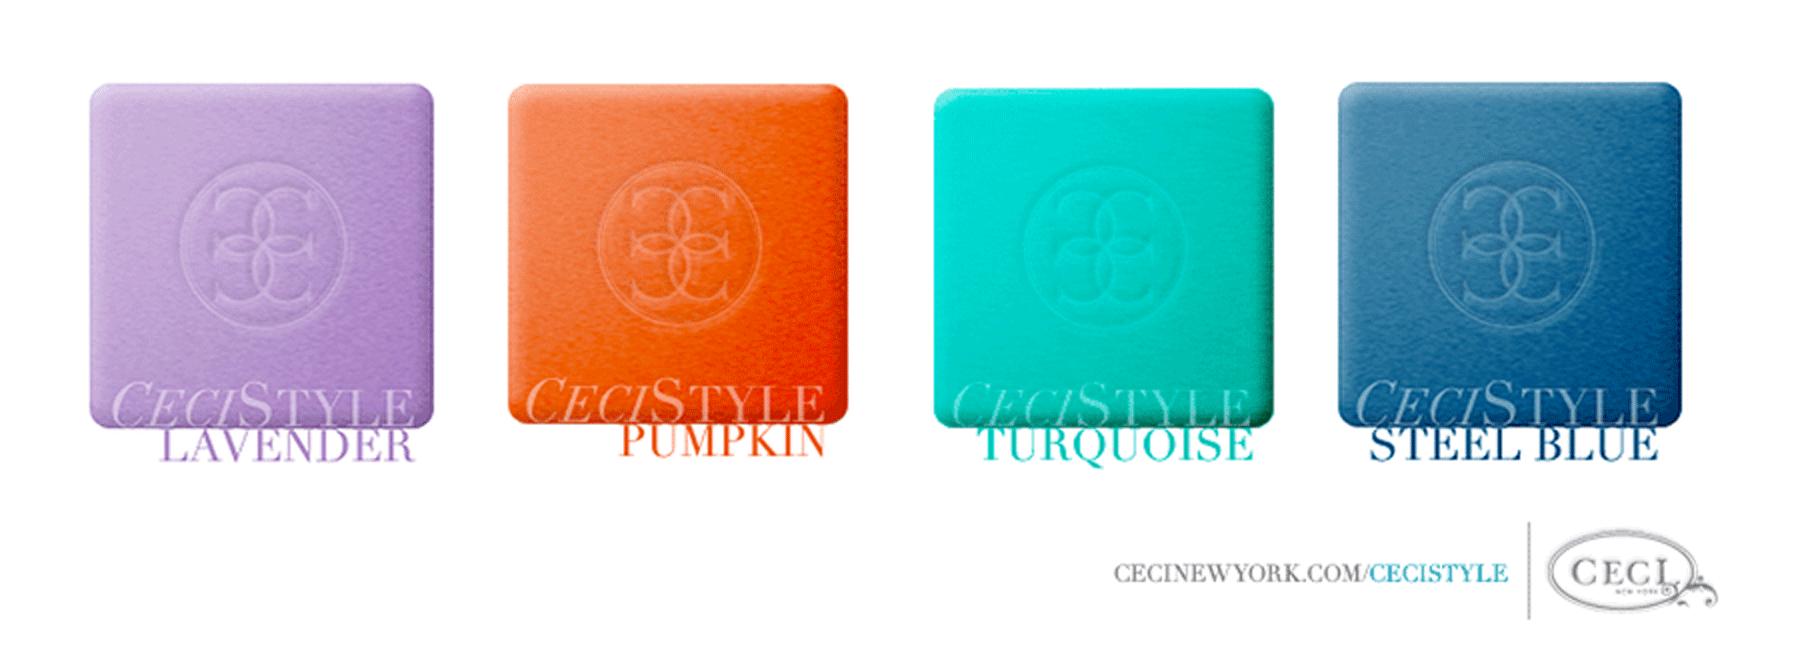 Ceci's Color Stories - Lavender & Pumpkin Birthday Party Color Swatches - color swatches, lavender, pumpkin, turquoise, steel blue, birthday party, color swatches